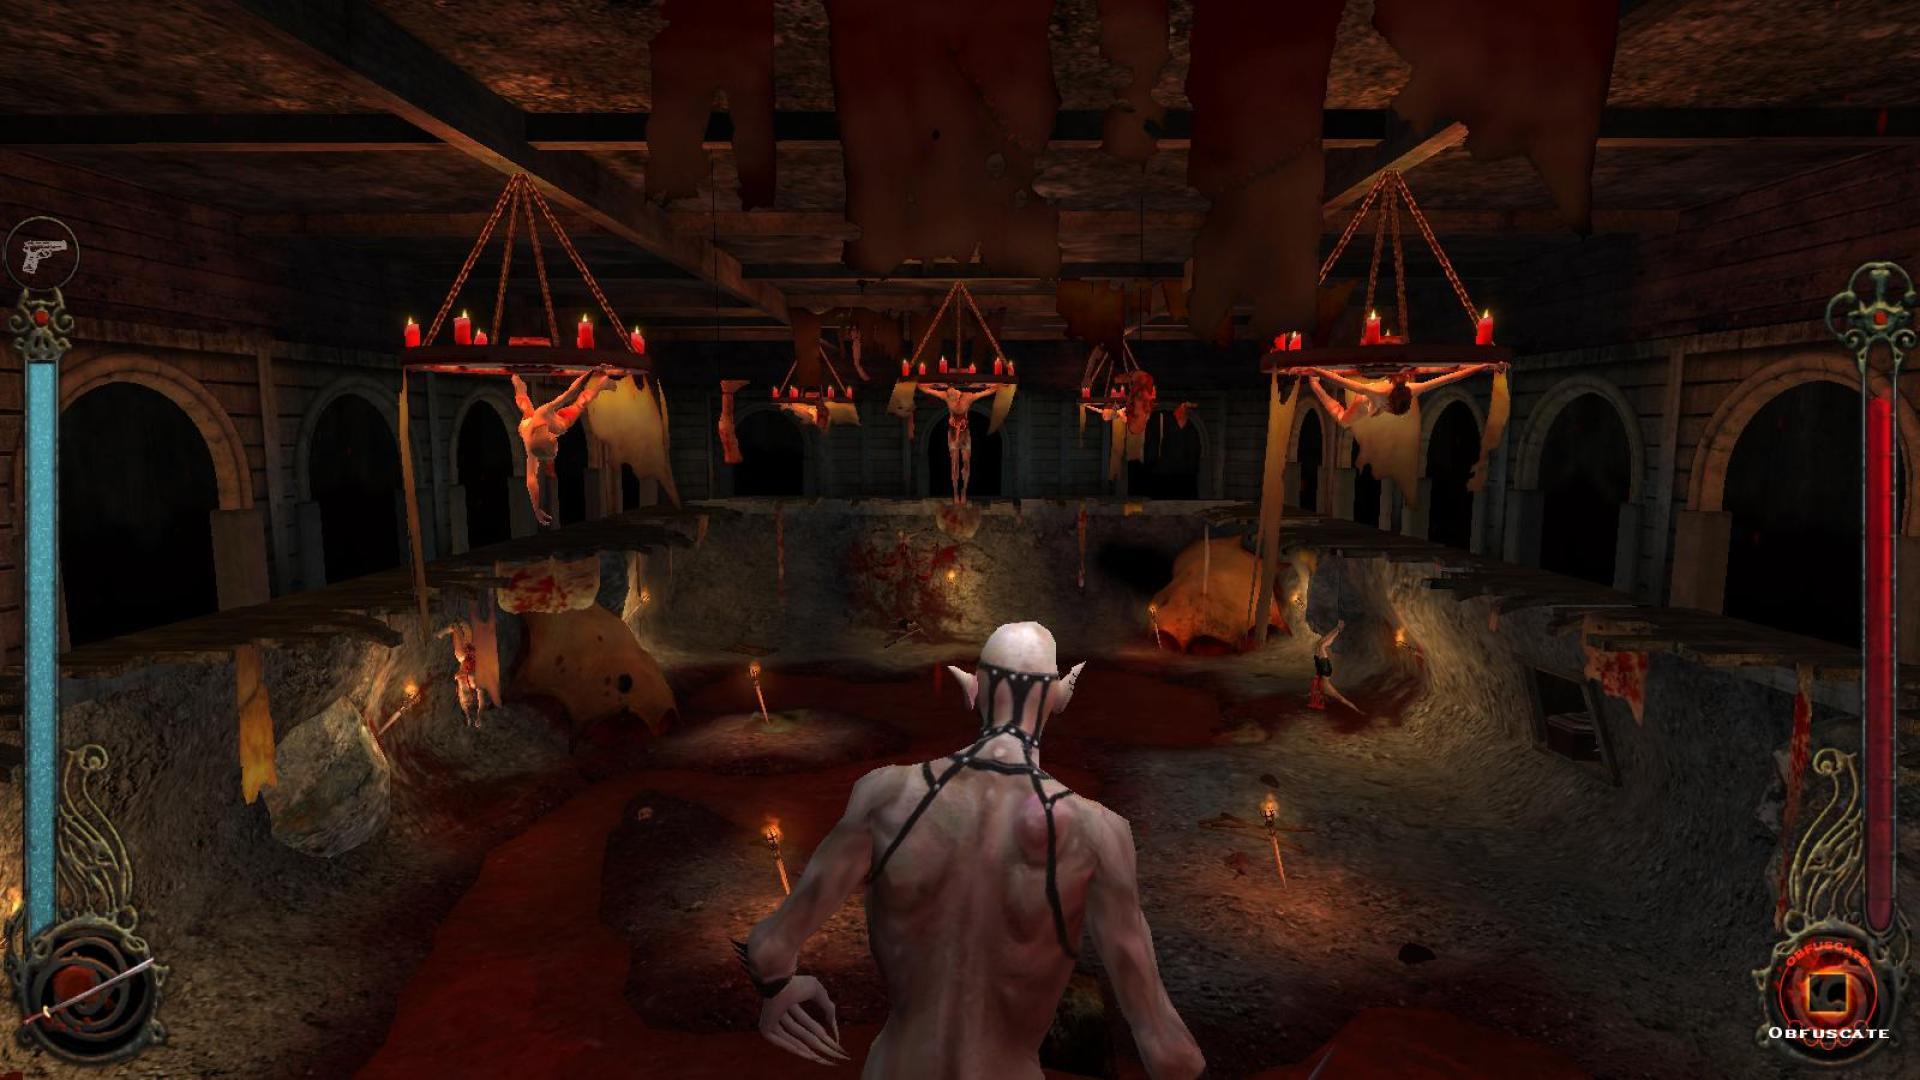 Vampire: The Masquerade - Bloodlines (2004) 8. kép